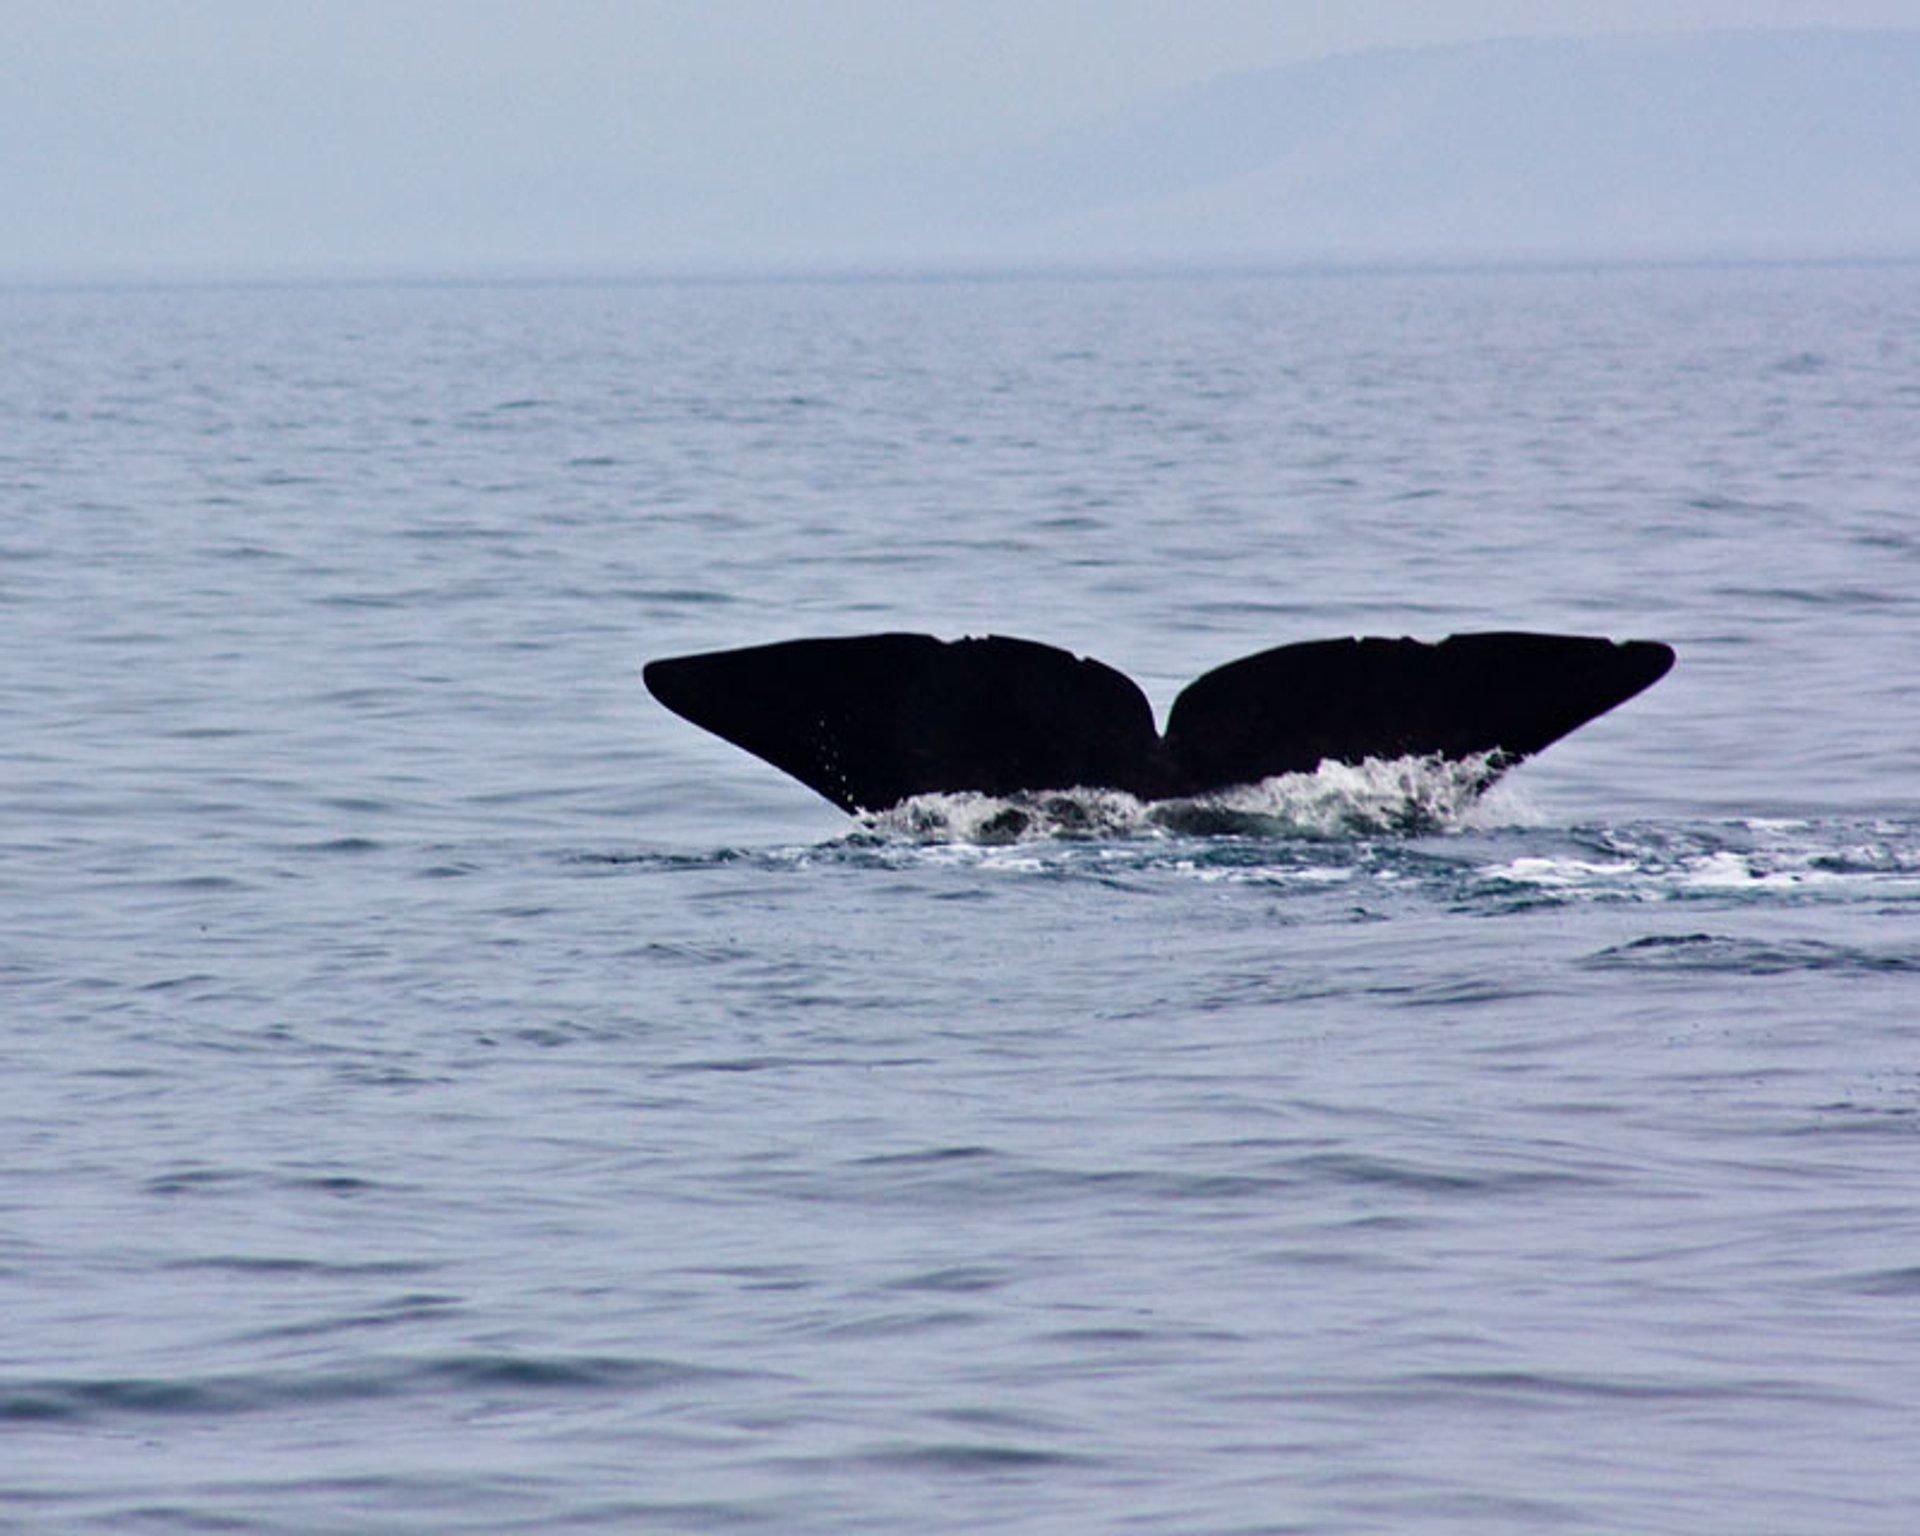 Whale watching in Rausu, Hokkaido 2020